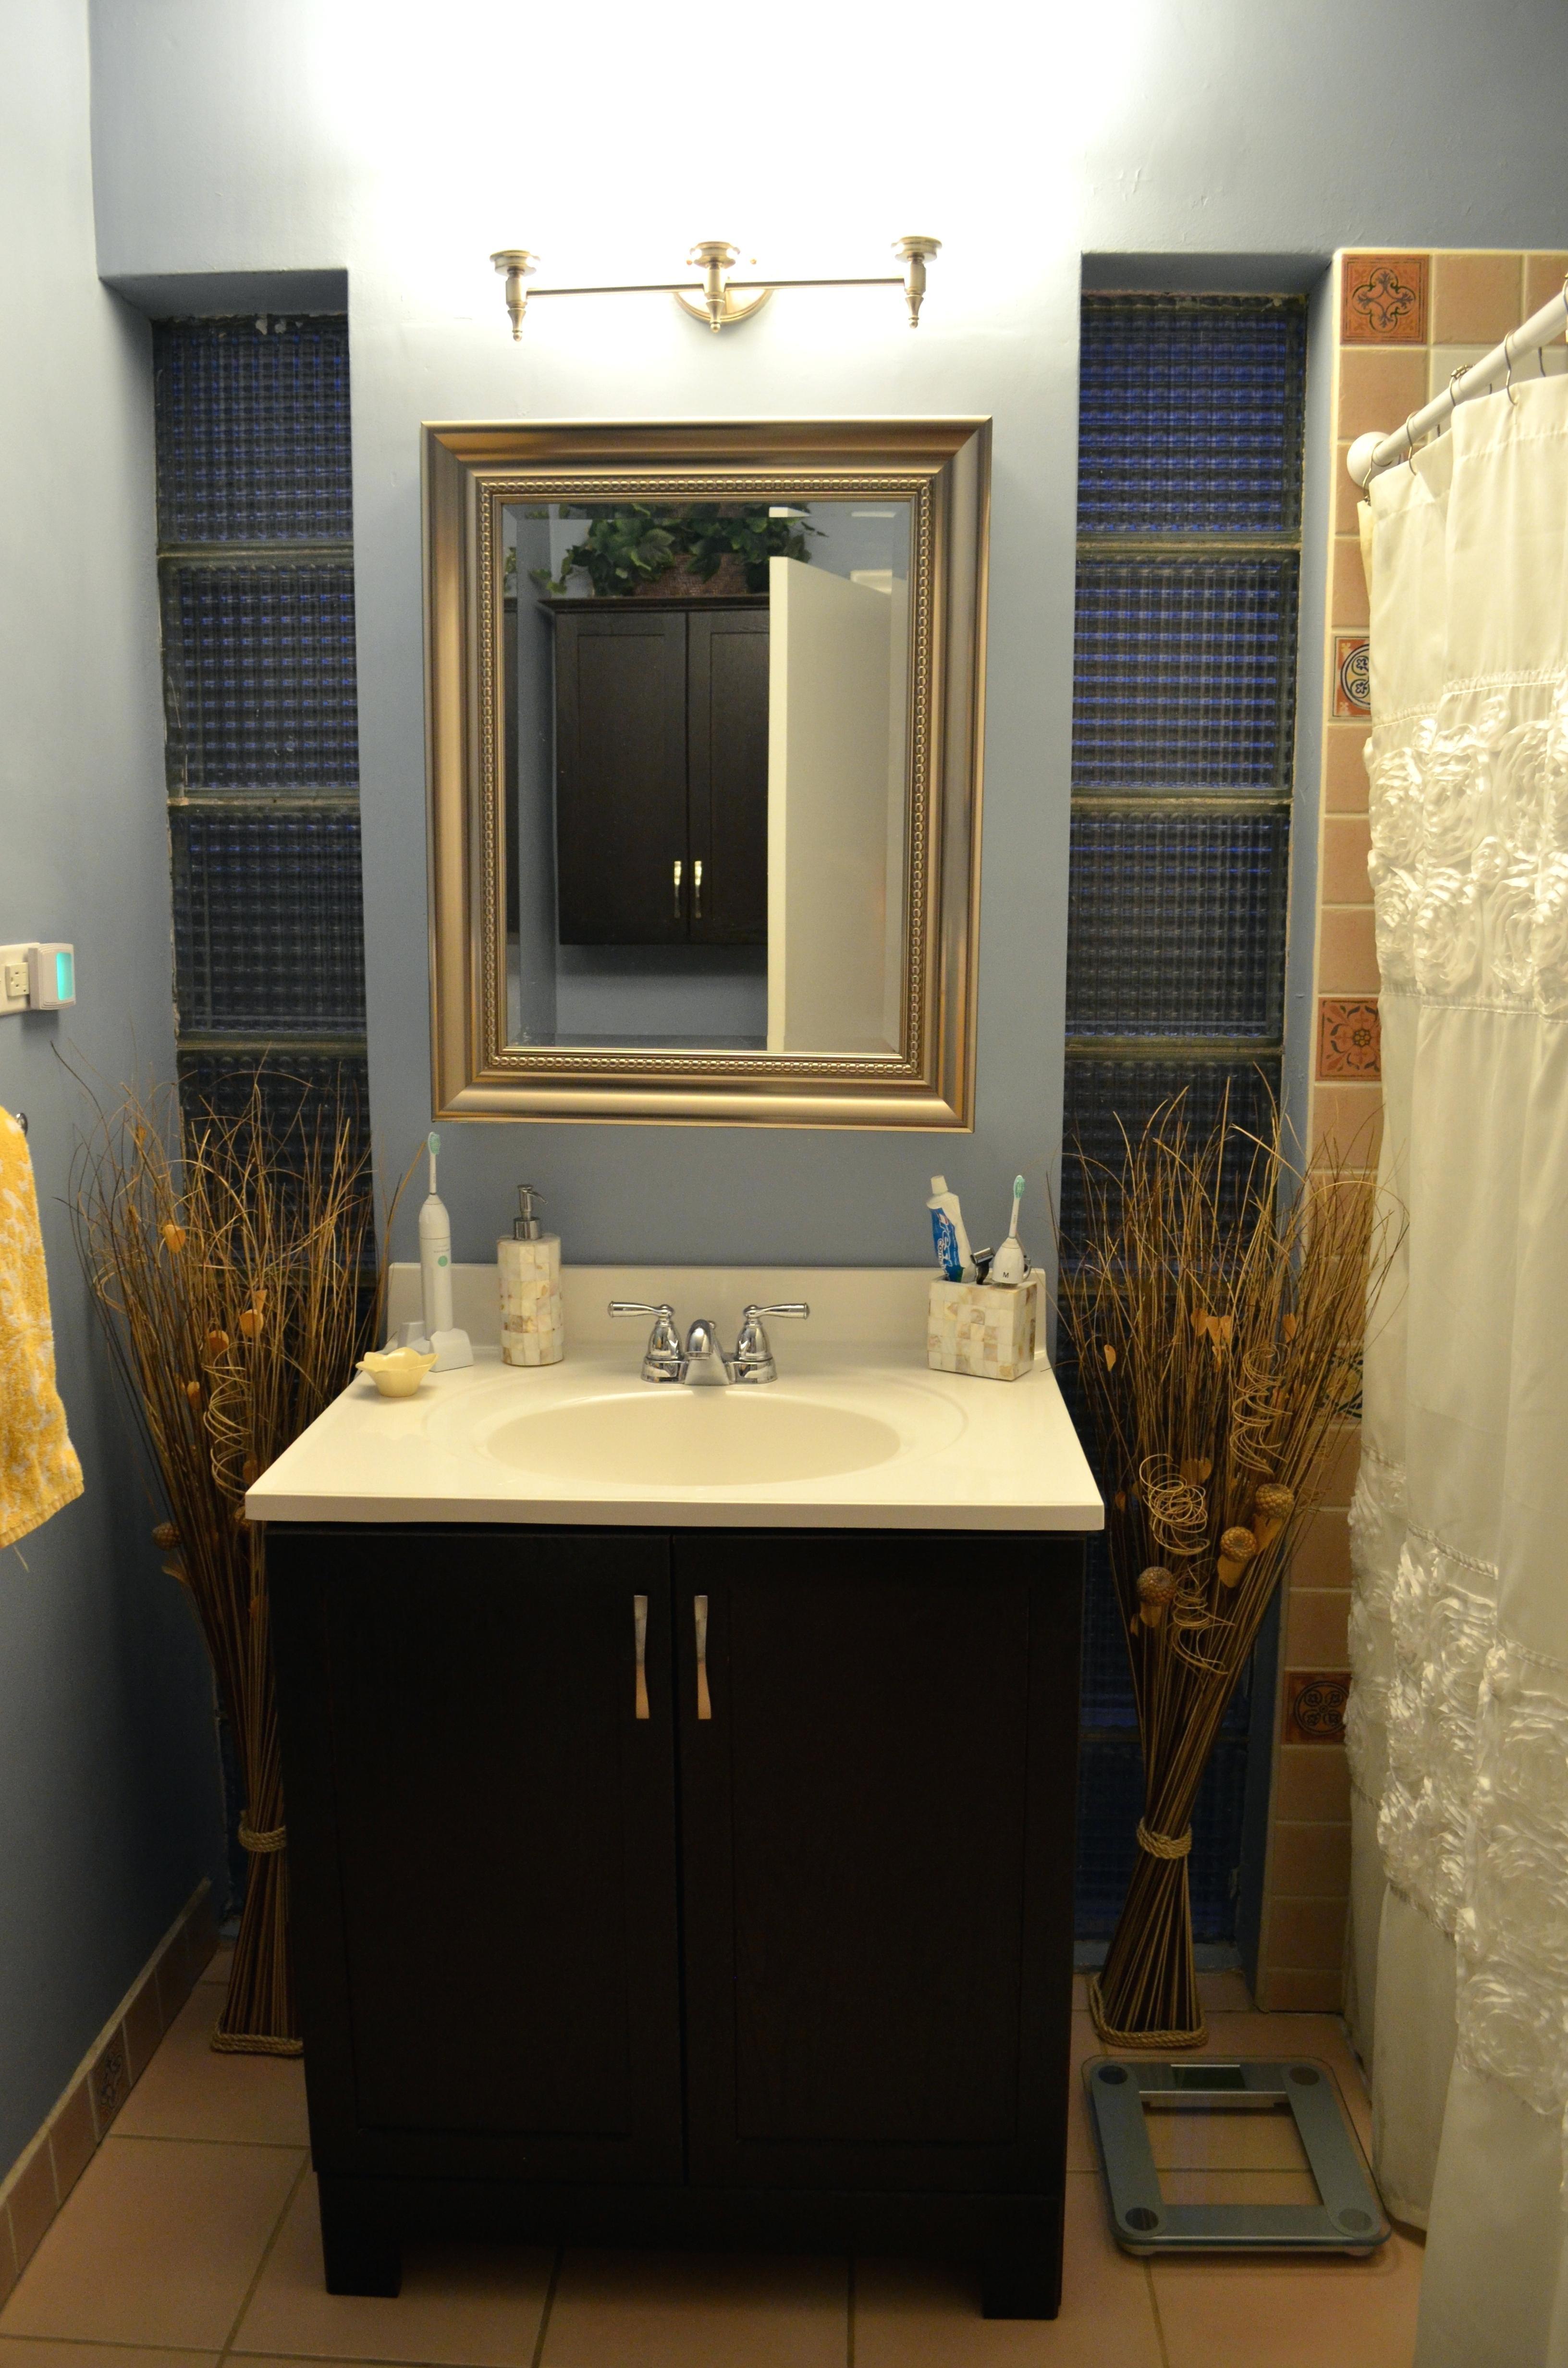 Bathroom Mirror Too Small